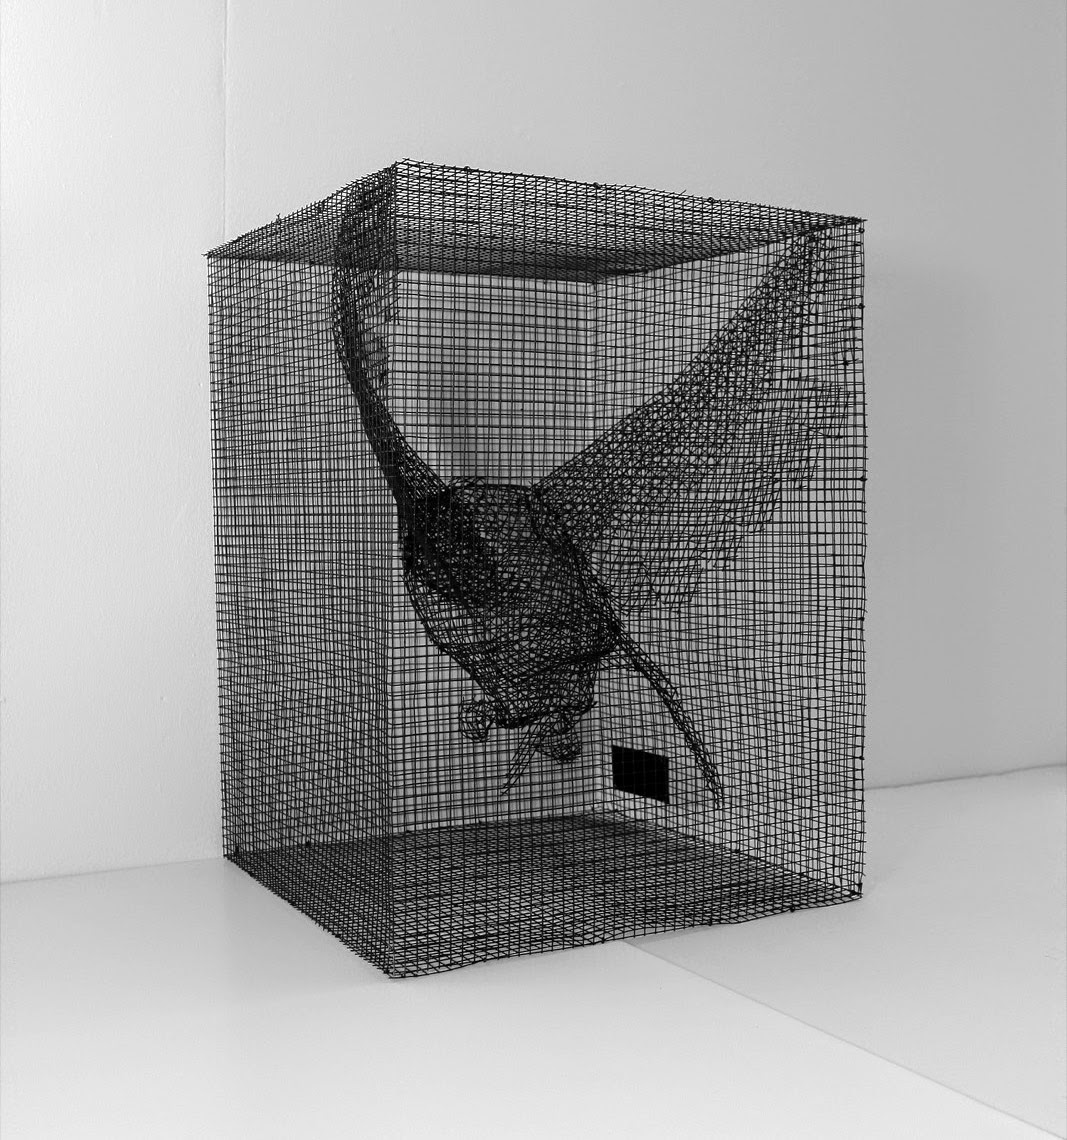 #edoardo tresoldi #streetartnews #justkidz #specialedition #edition  #sculpting #reason #bird  #mesh #transparence